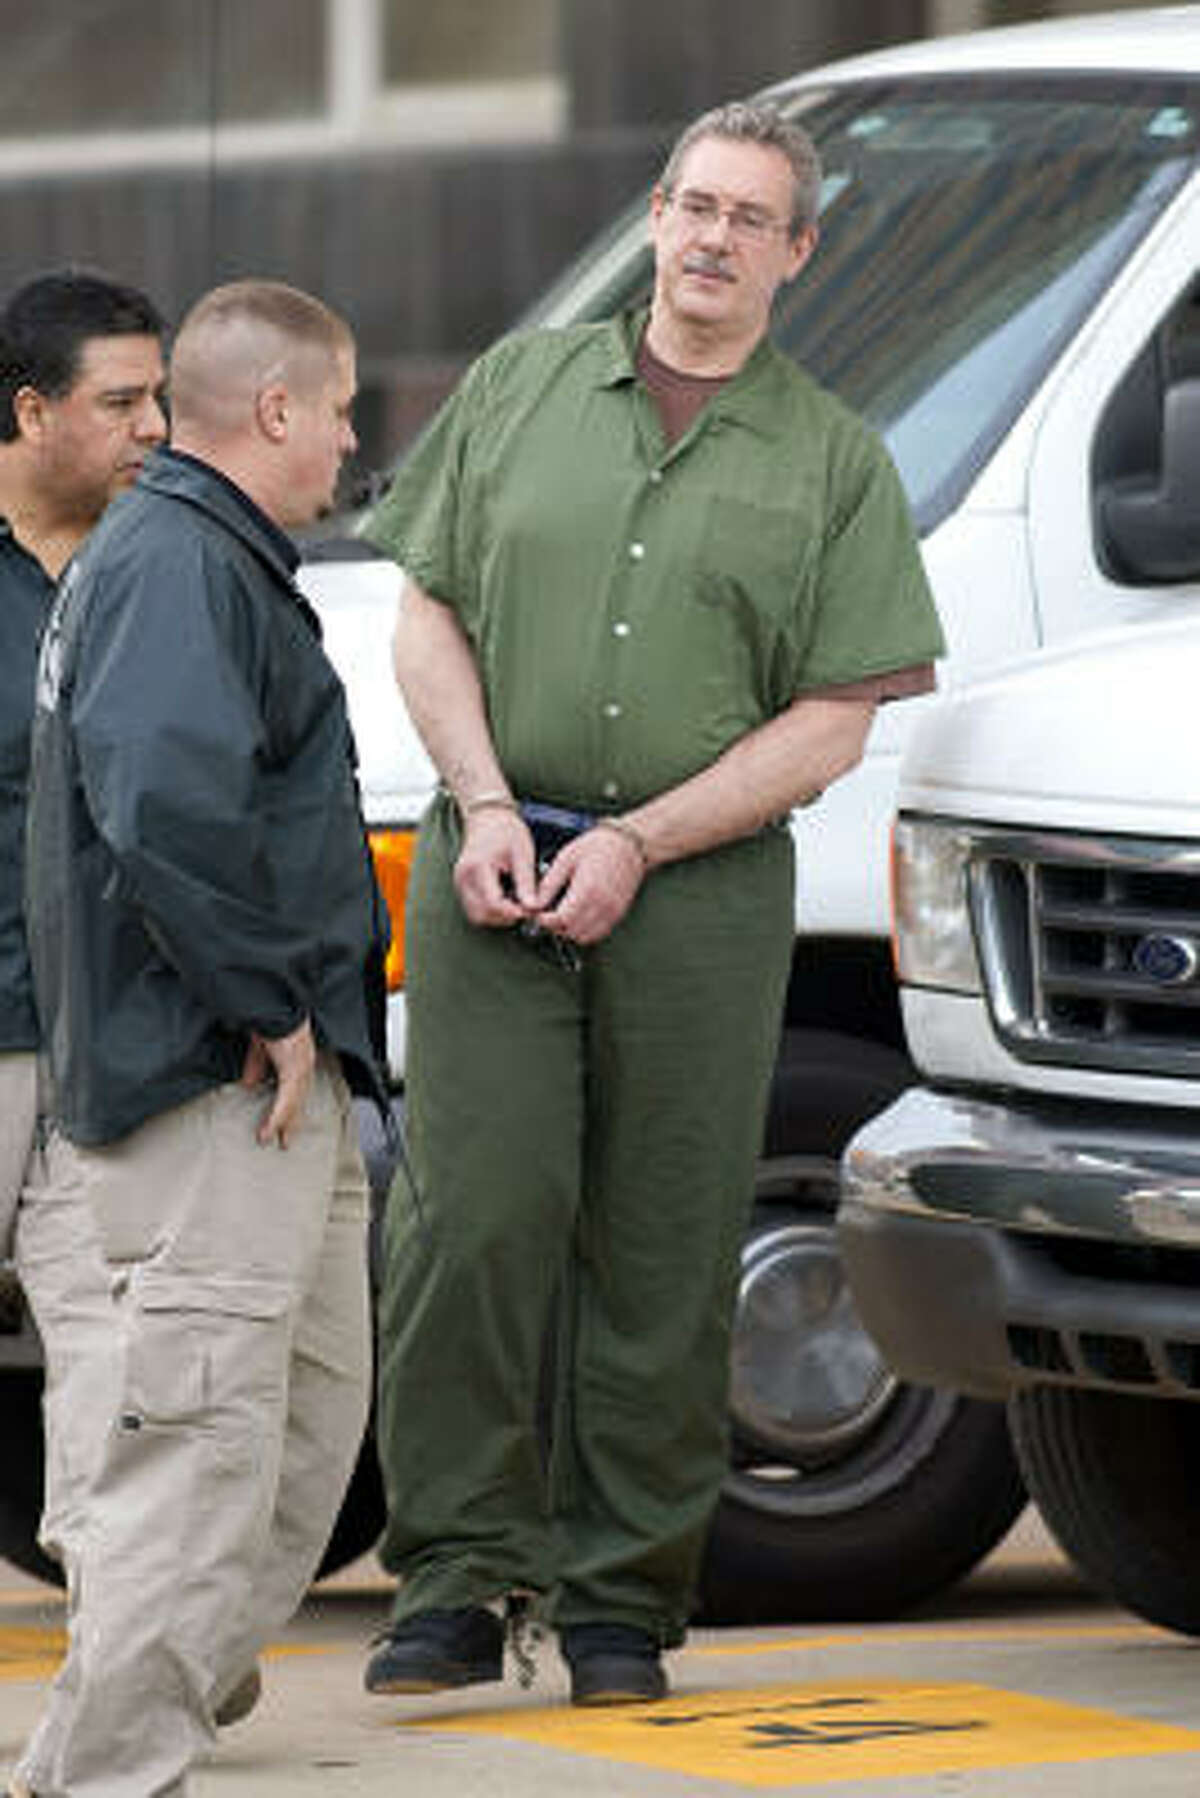 Alleged Ponzi scheme leader R. Allen Stanford has been held in federal custody without bail.